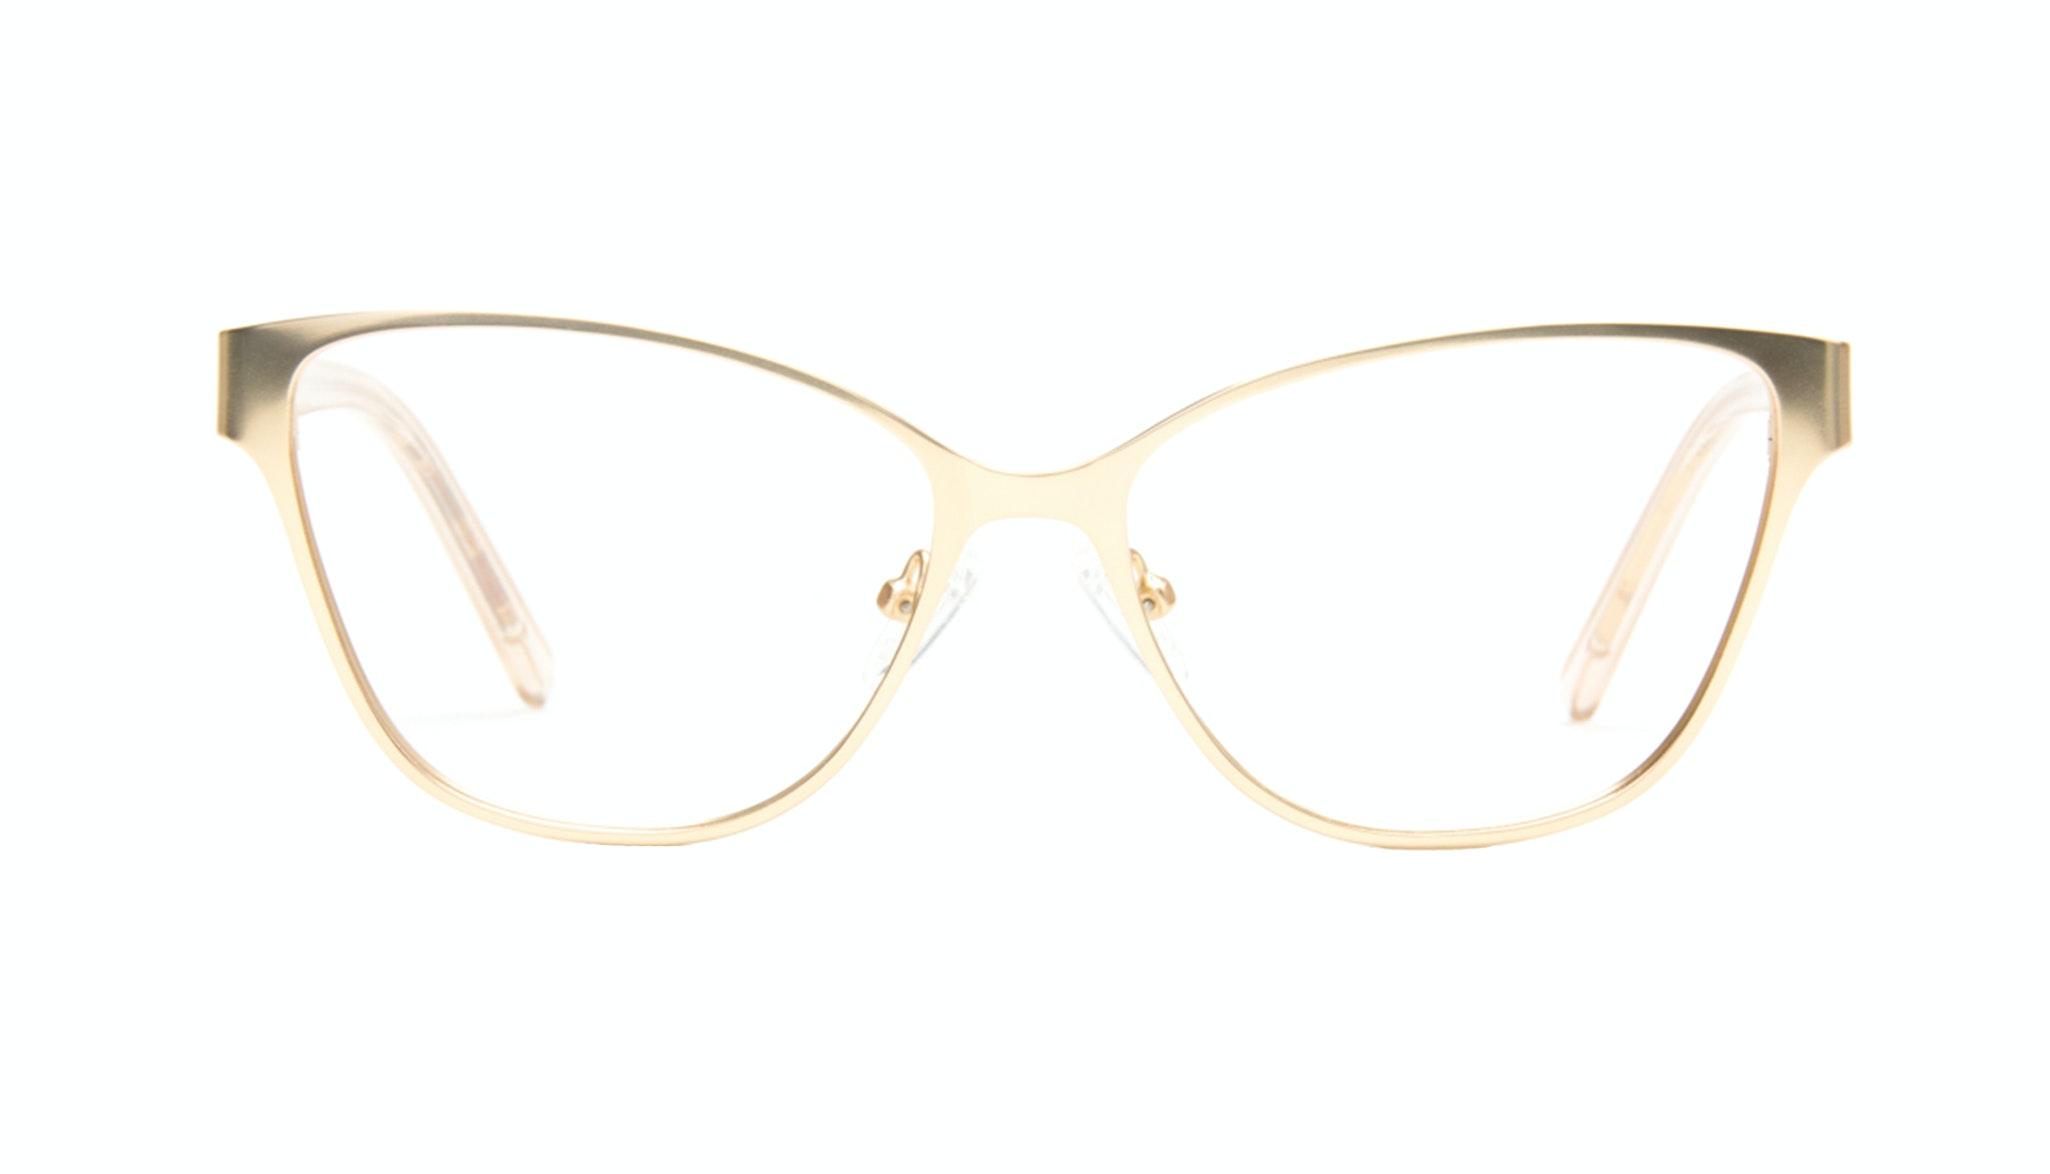 Affordable Fashion Glasses Cat Eye Rectangle Eyeglasses Women Radiant Gold Front